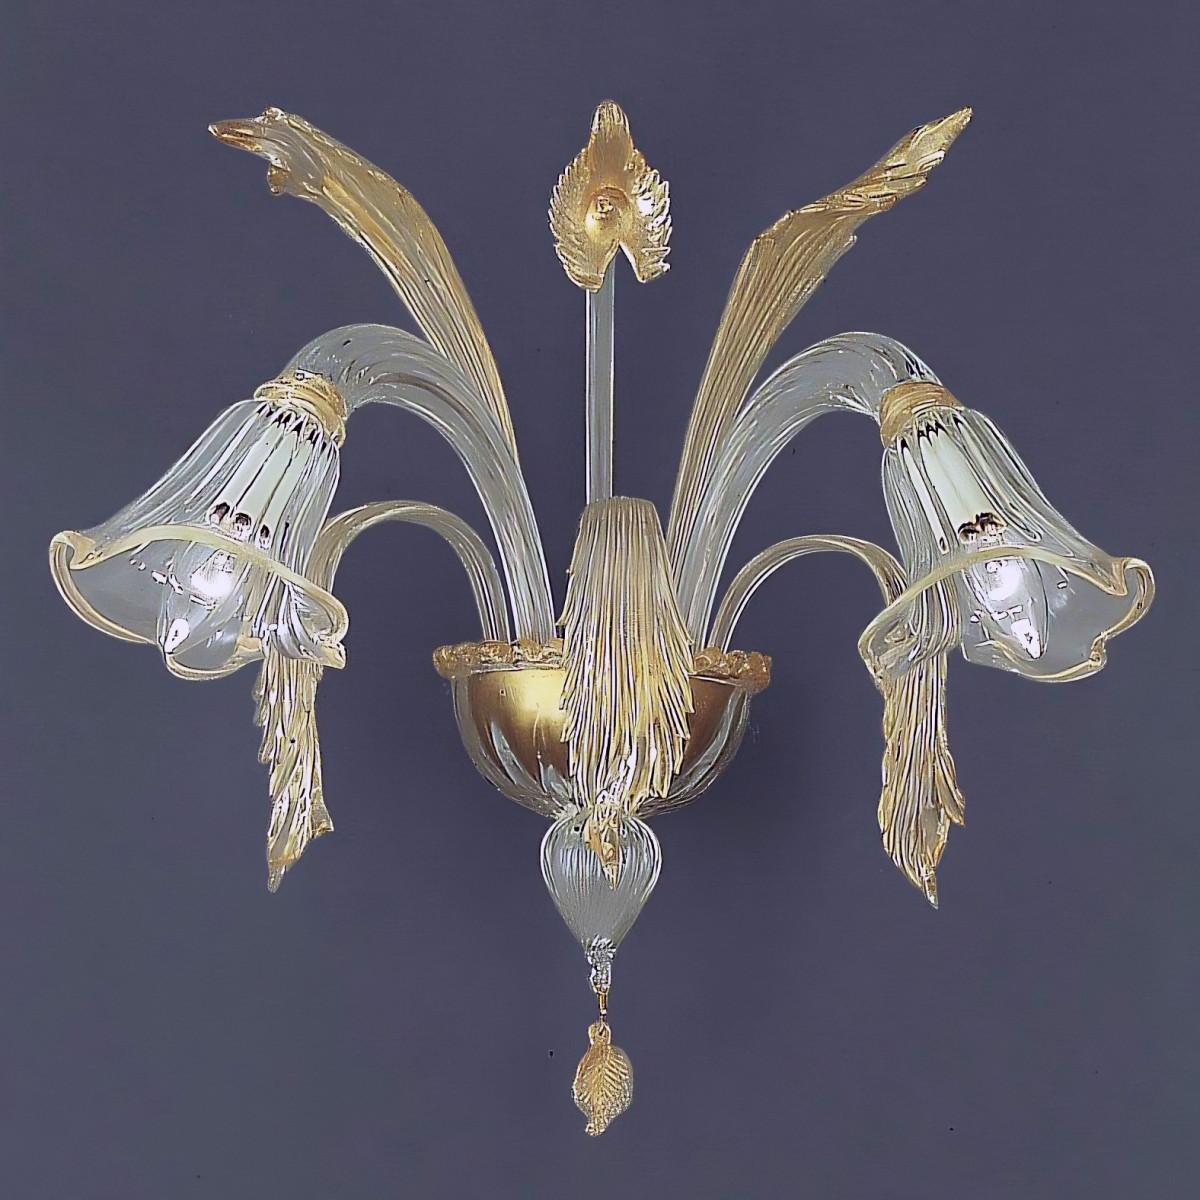 Laguna 2 luces Murano aplique - color transparente oro